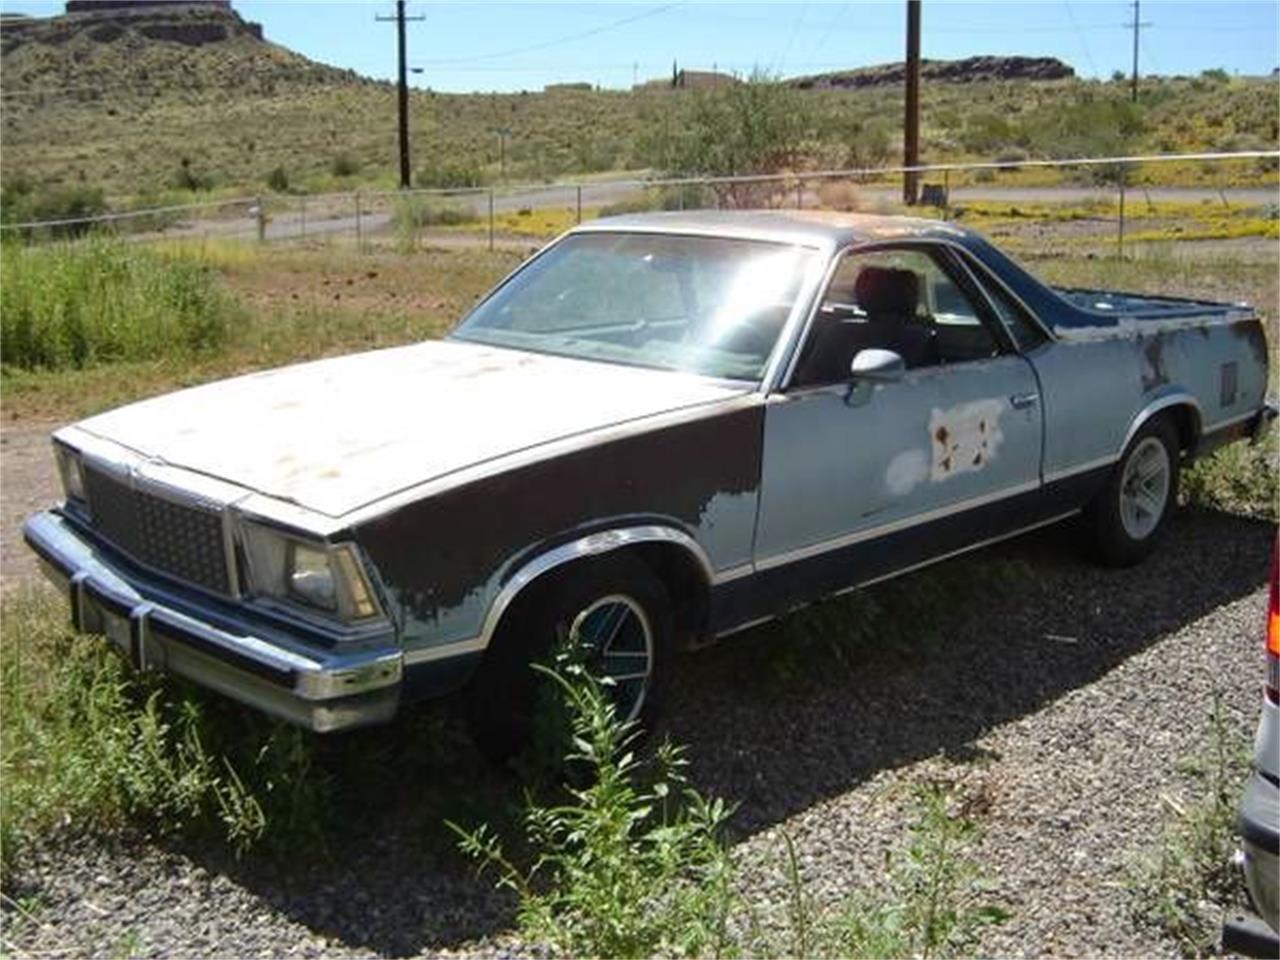 for sale 1978 gmc caballero in cadillac, michigan cars - cadillac, mi at geebo